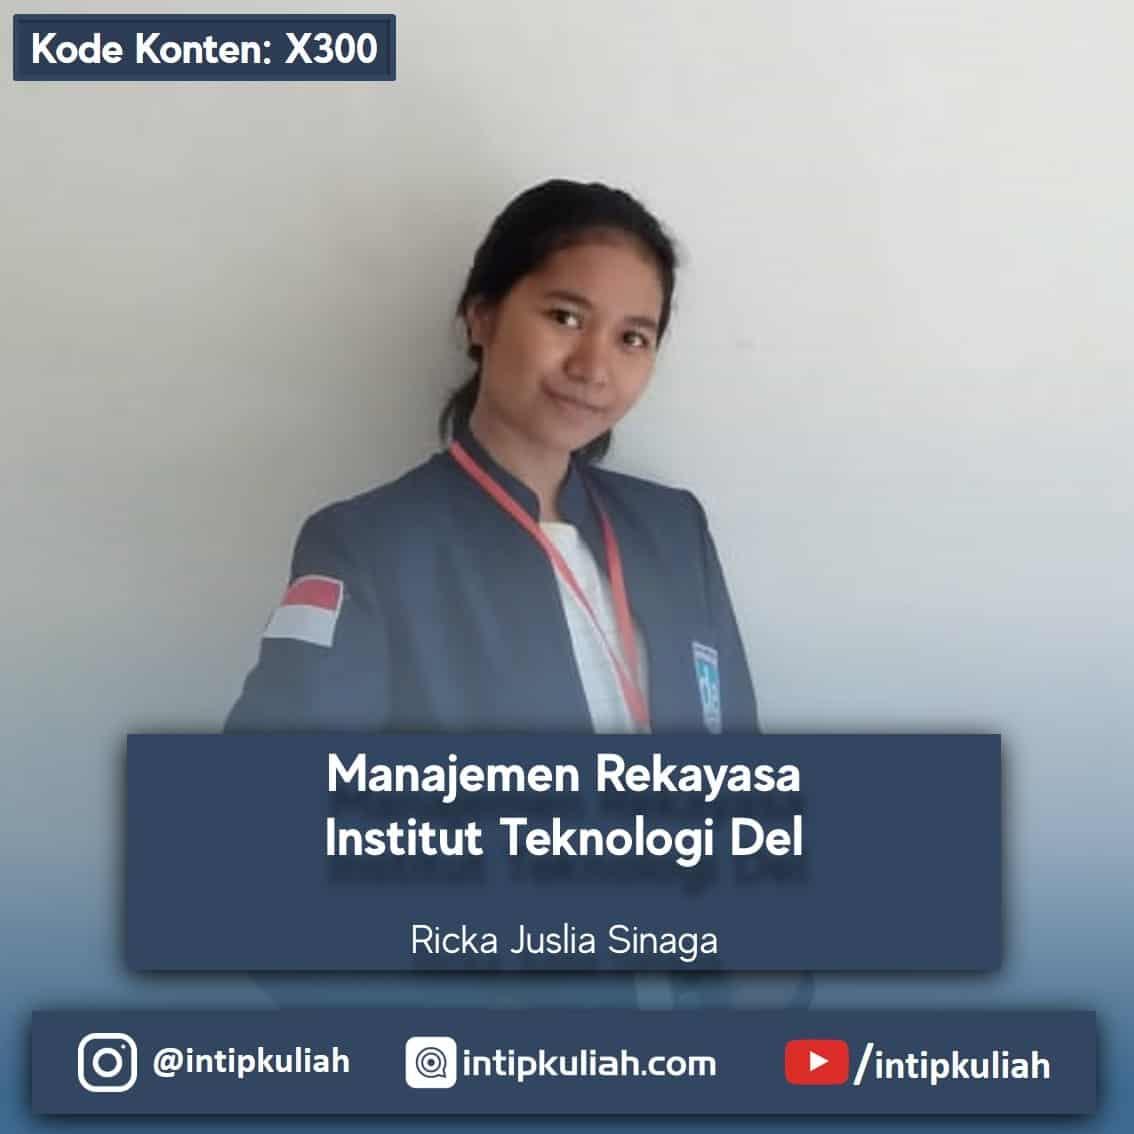 Manajemen Rekayasa IT Del / Institut Teknologi Del (Ricka)